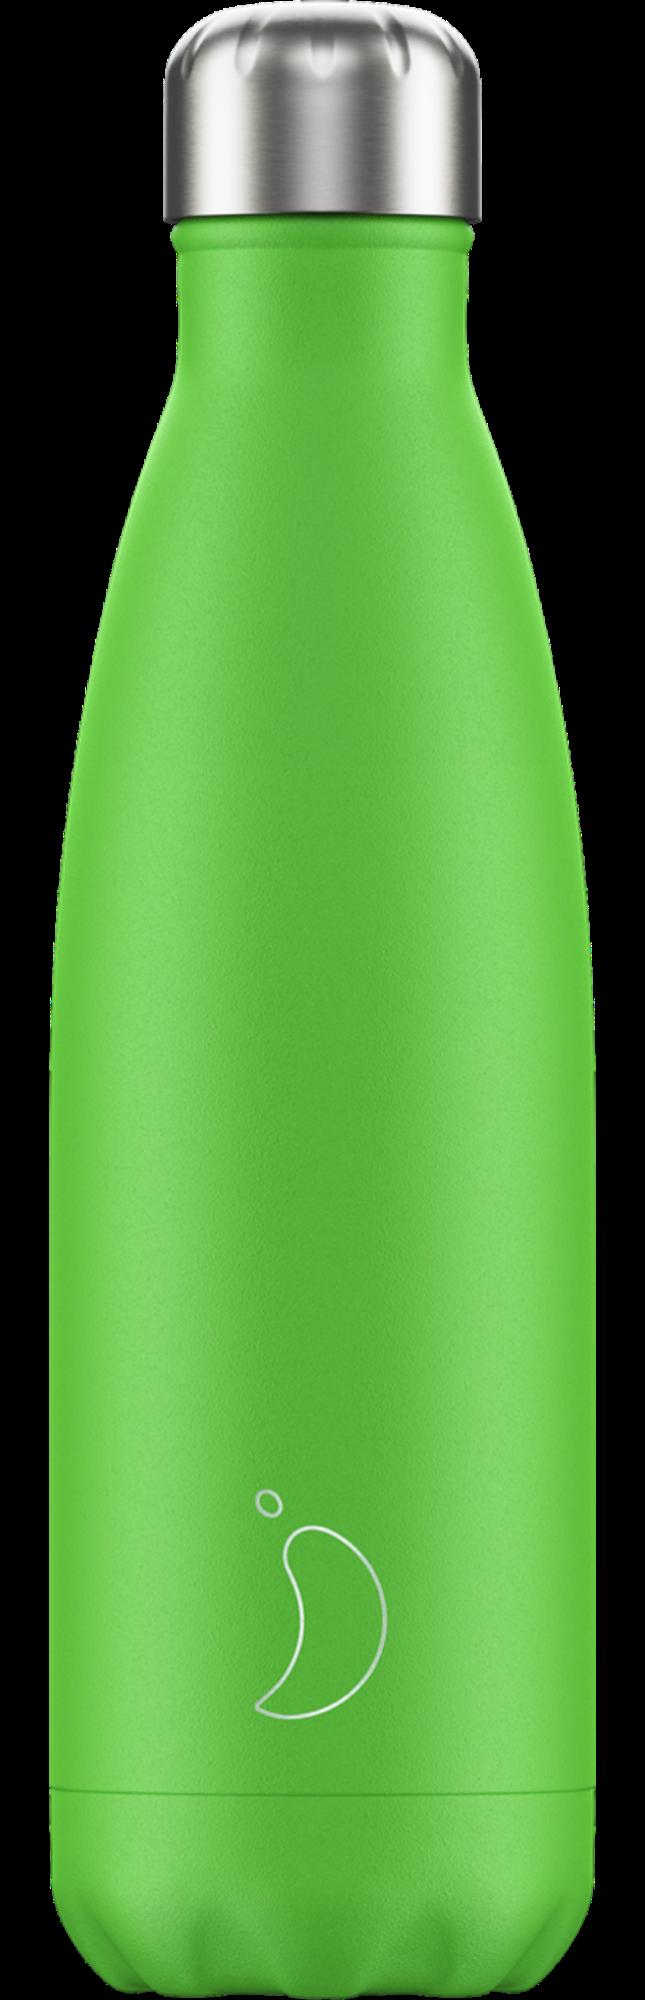 CHILLY'S BOTTLE 500ML - [NEON] GREEN